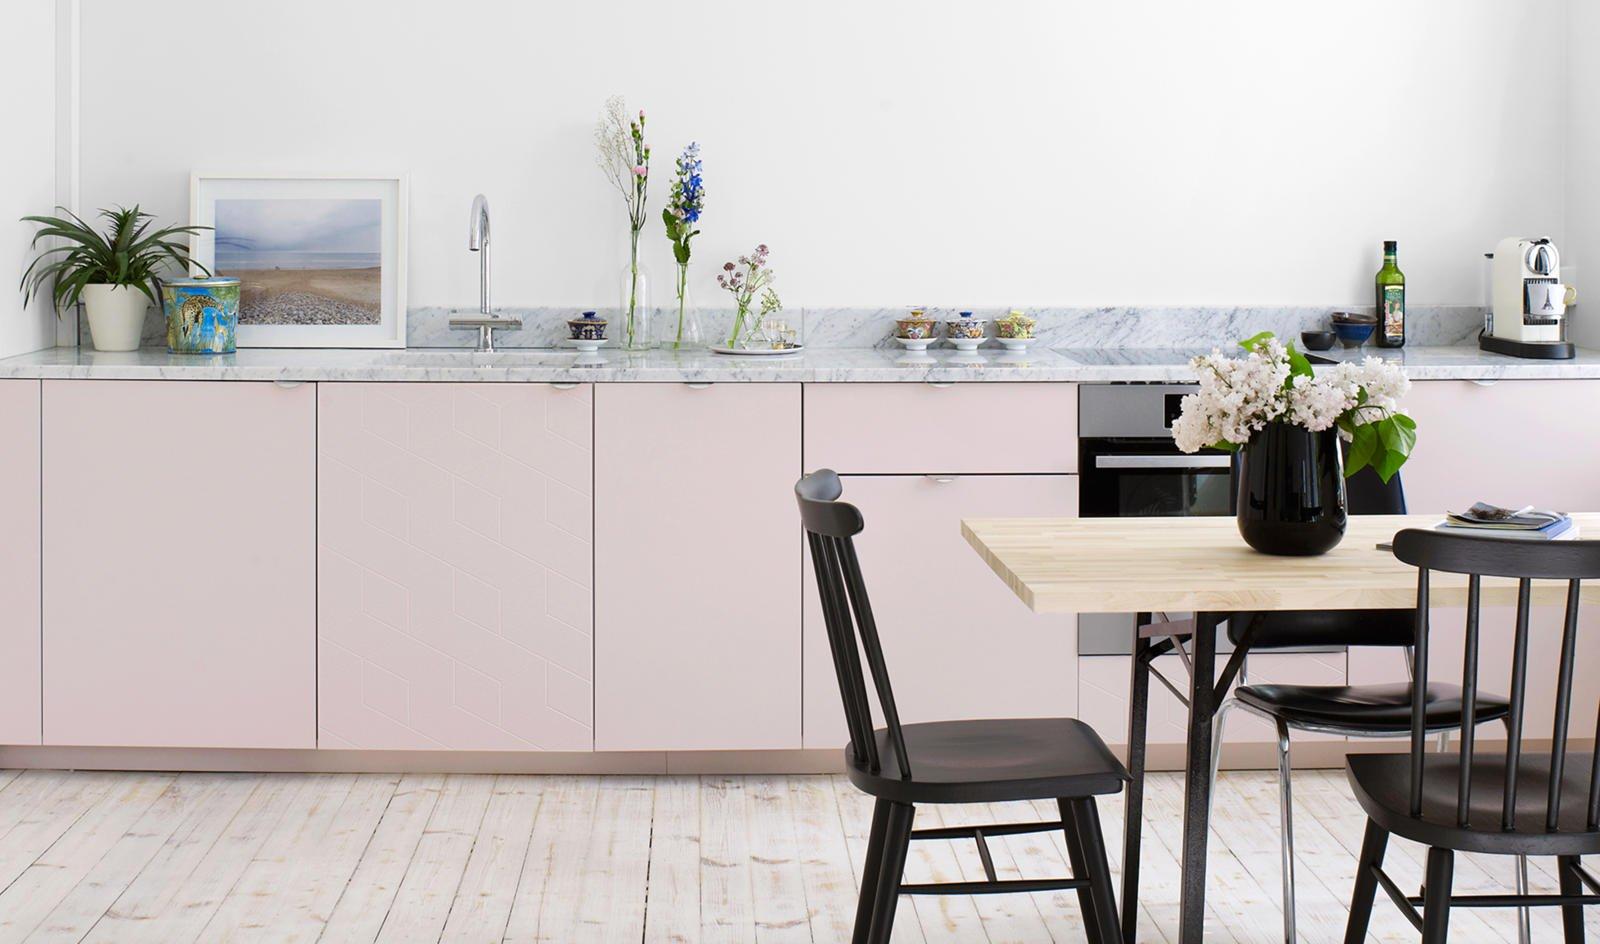 IKEA hack : comment customiser une cuisine IKEA - FrenchyFancy